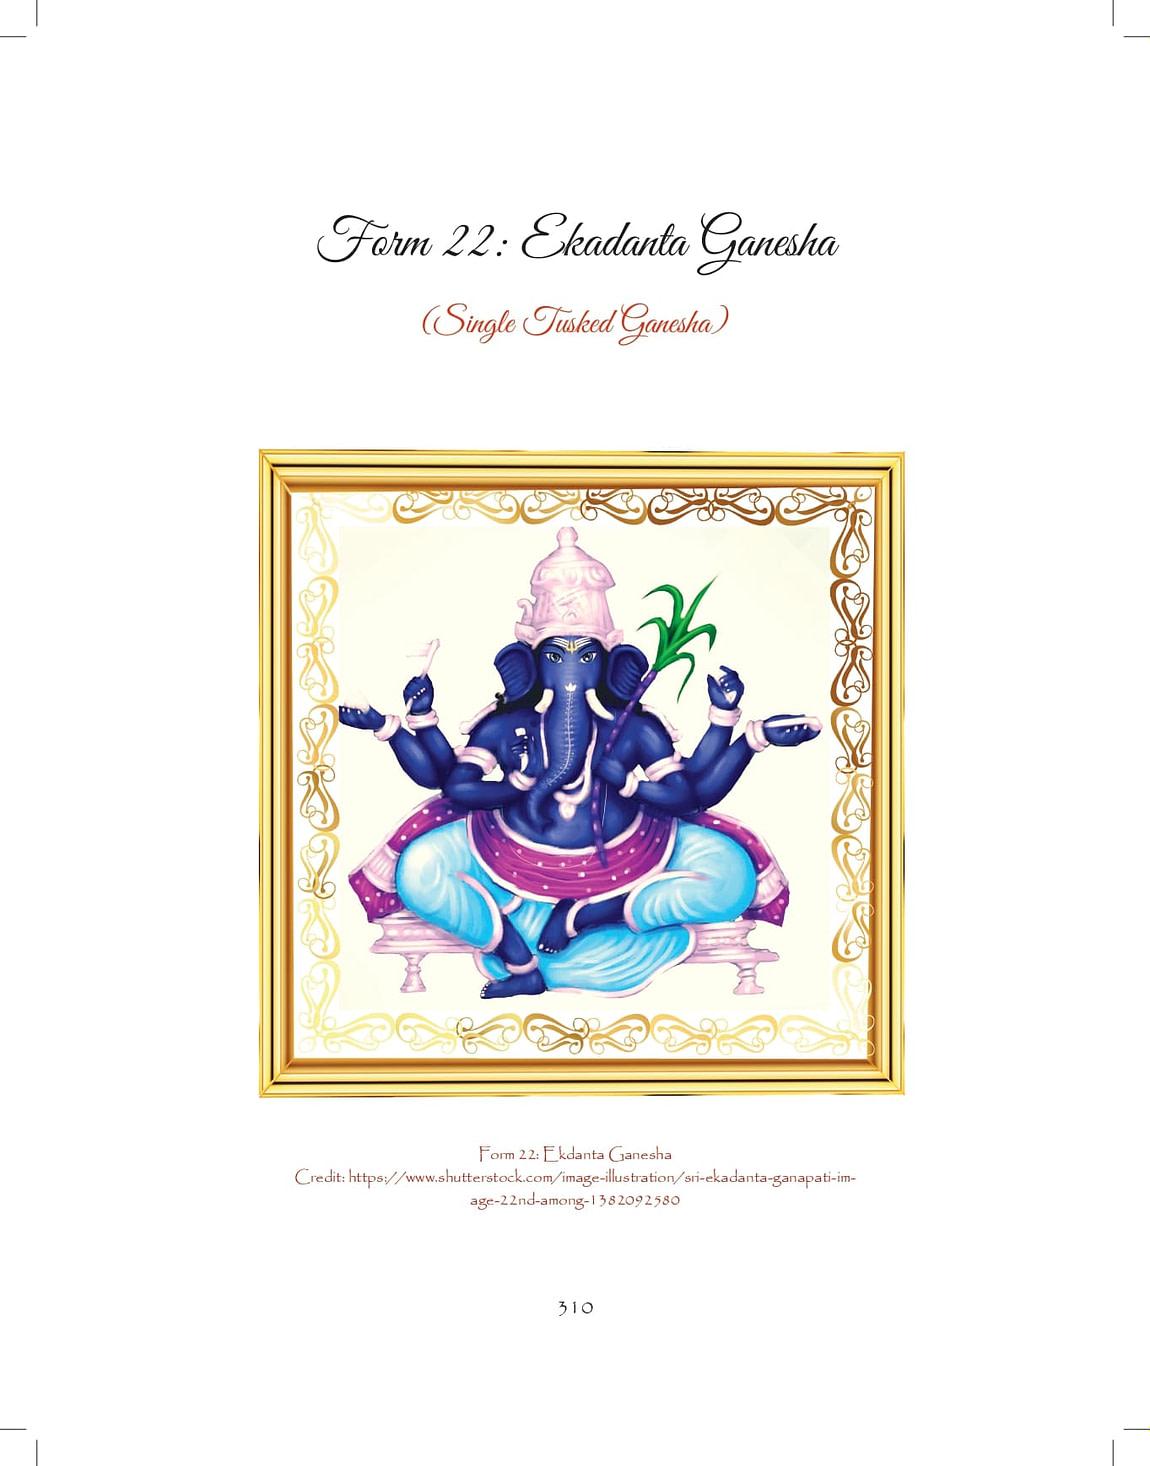 Ganesh-print_pages-to-jpg-0310.jpg